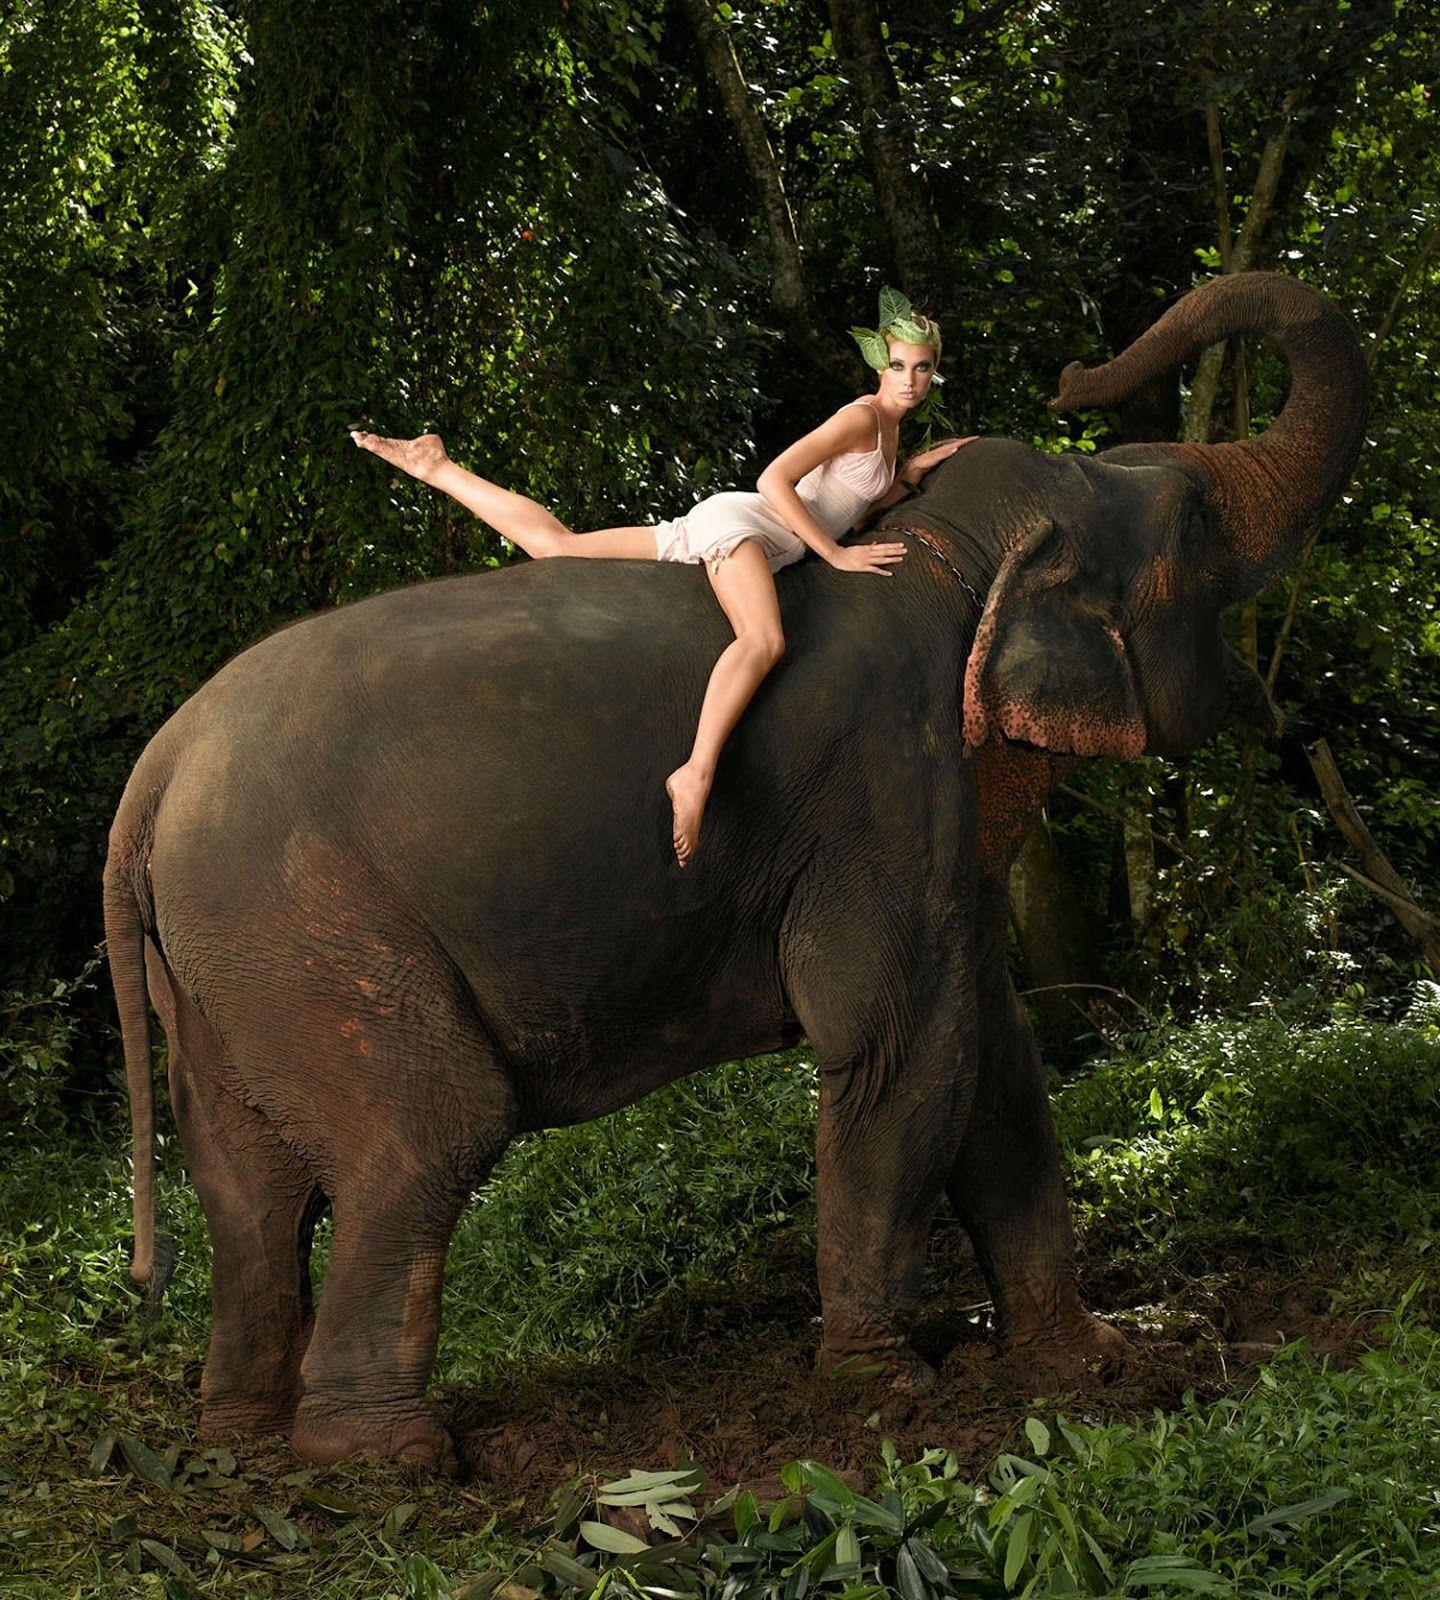 83e3589a76bd39 Sara Albert - Posing on an elephant for Venus Vibrance - Photo by Pongsak  Tangtiwaja - Cycle 6